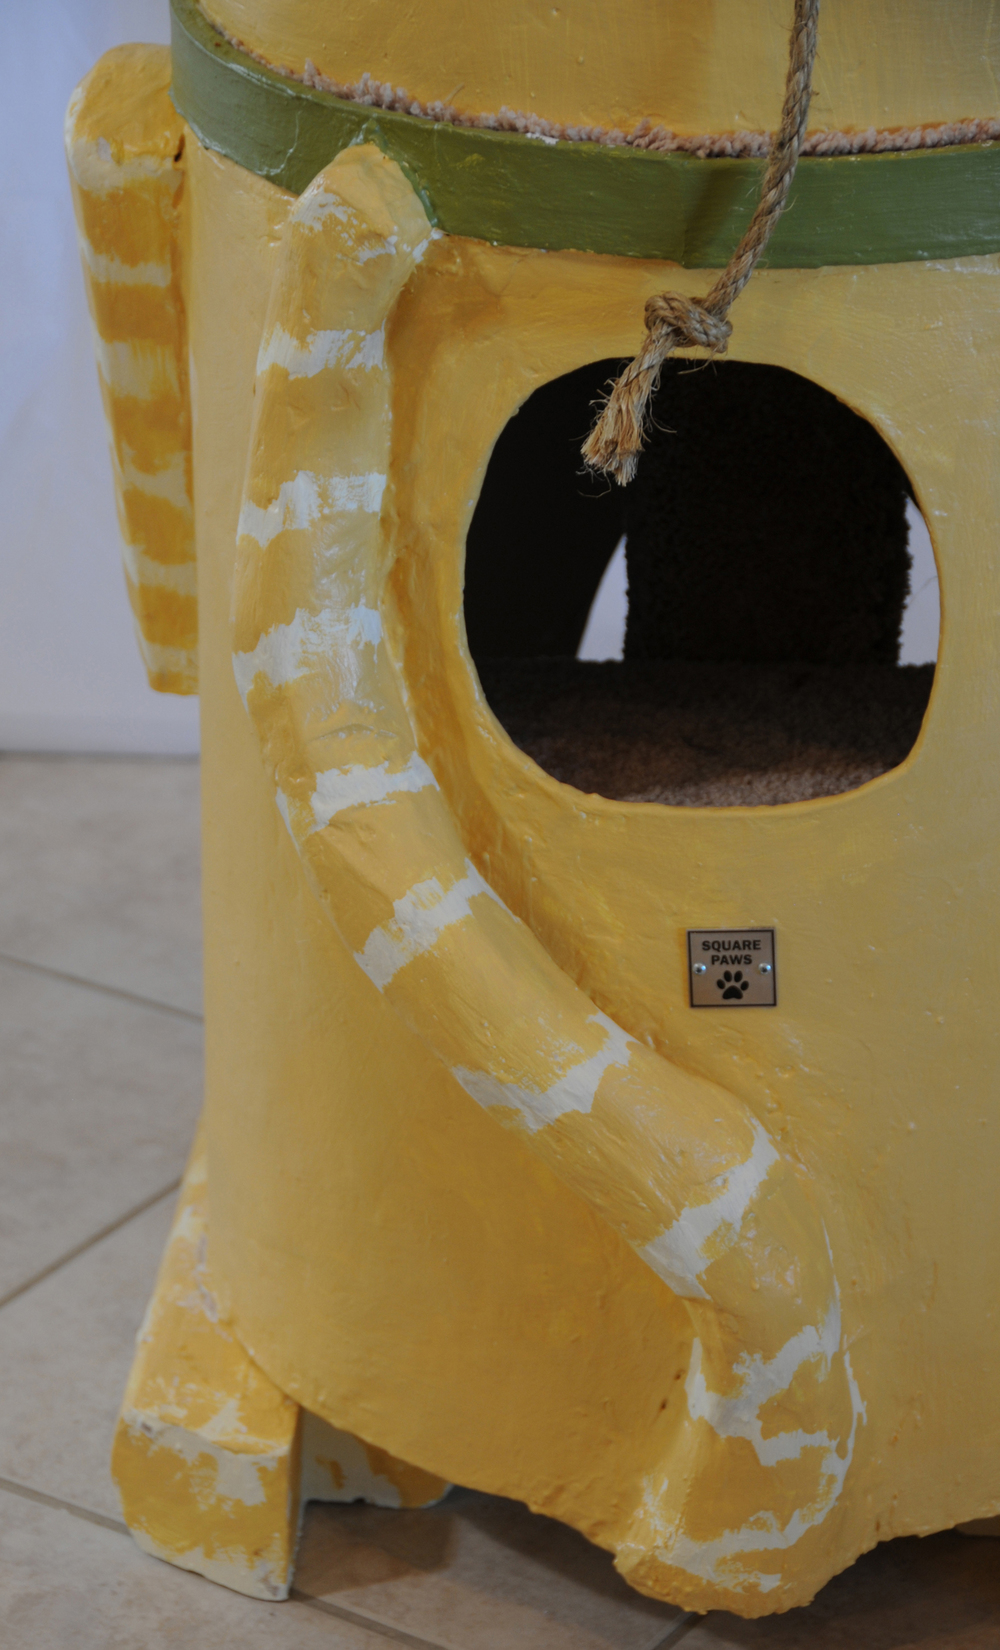 Square Paws Totem Pole